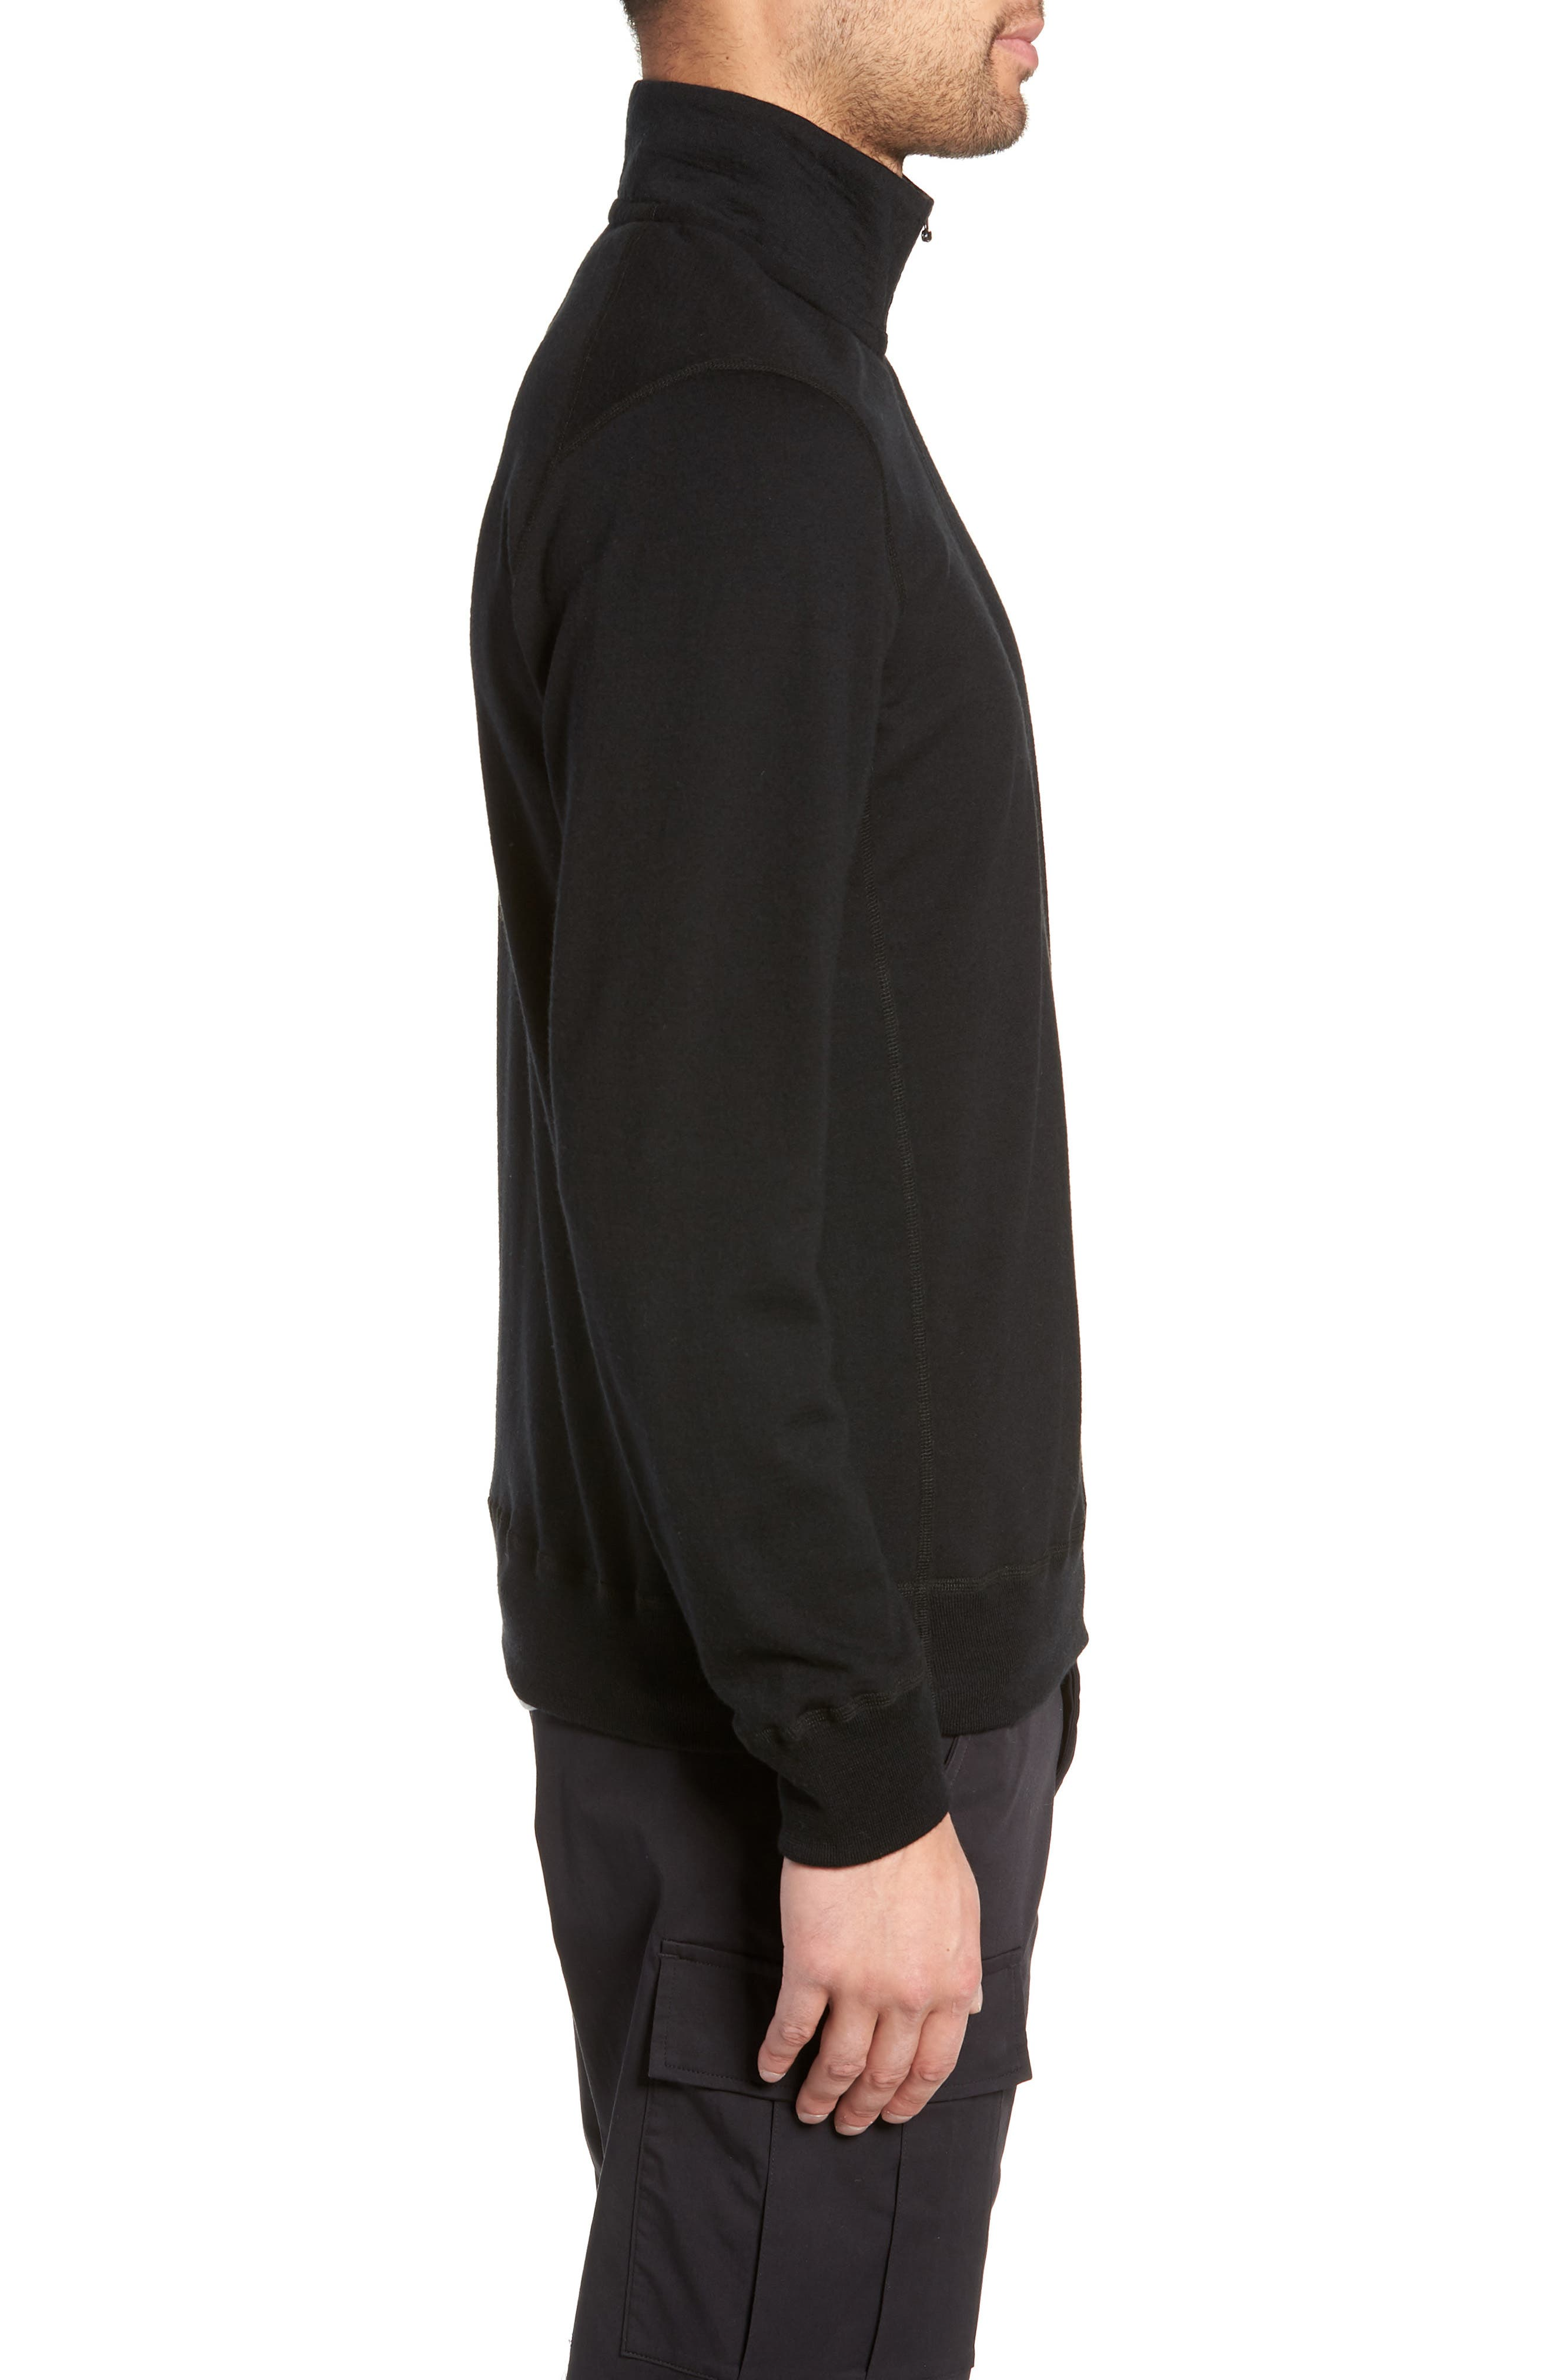 Swedish Merino Wool Trail Shirt,                             Alternate thumbnail 3, color,                             BLACK